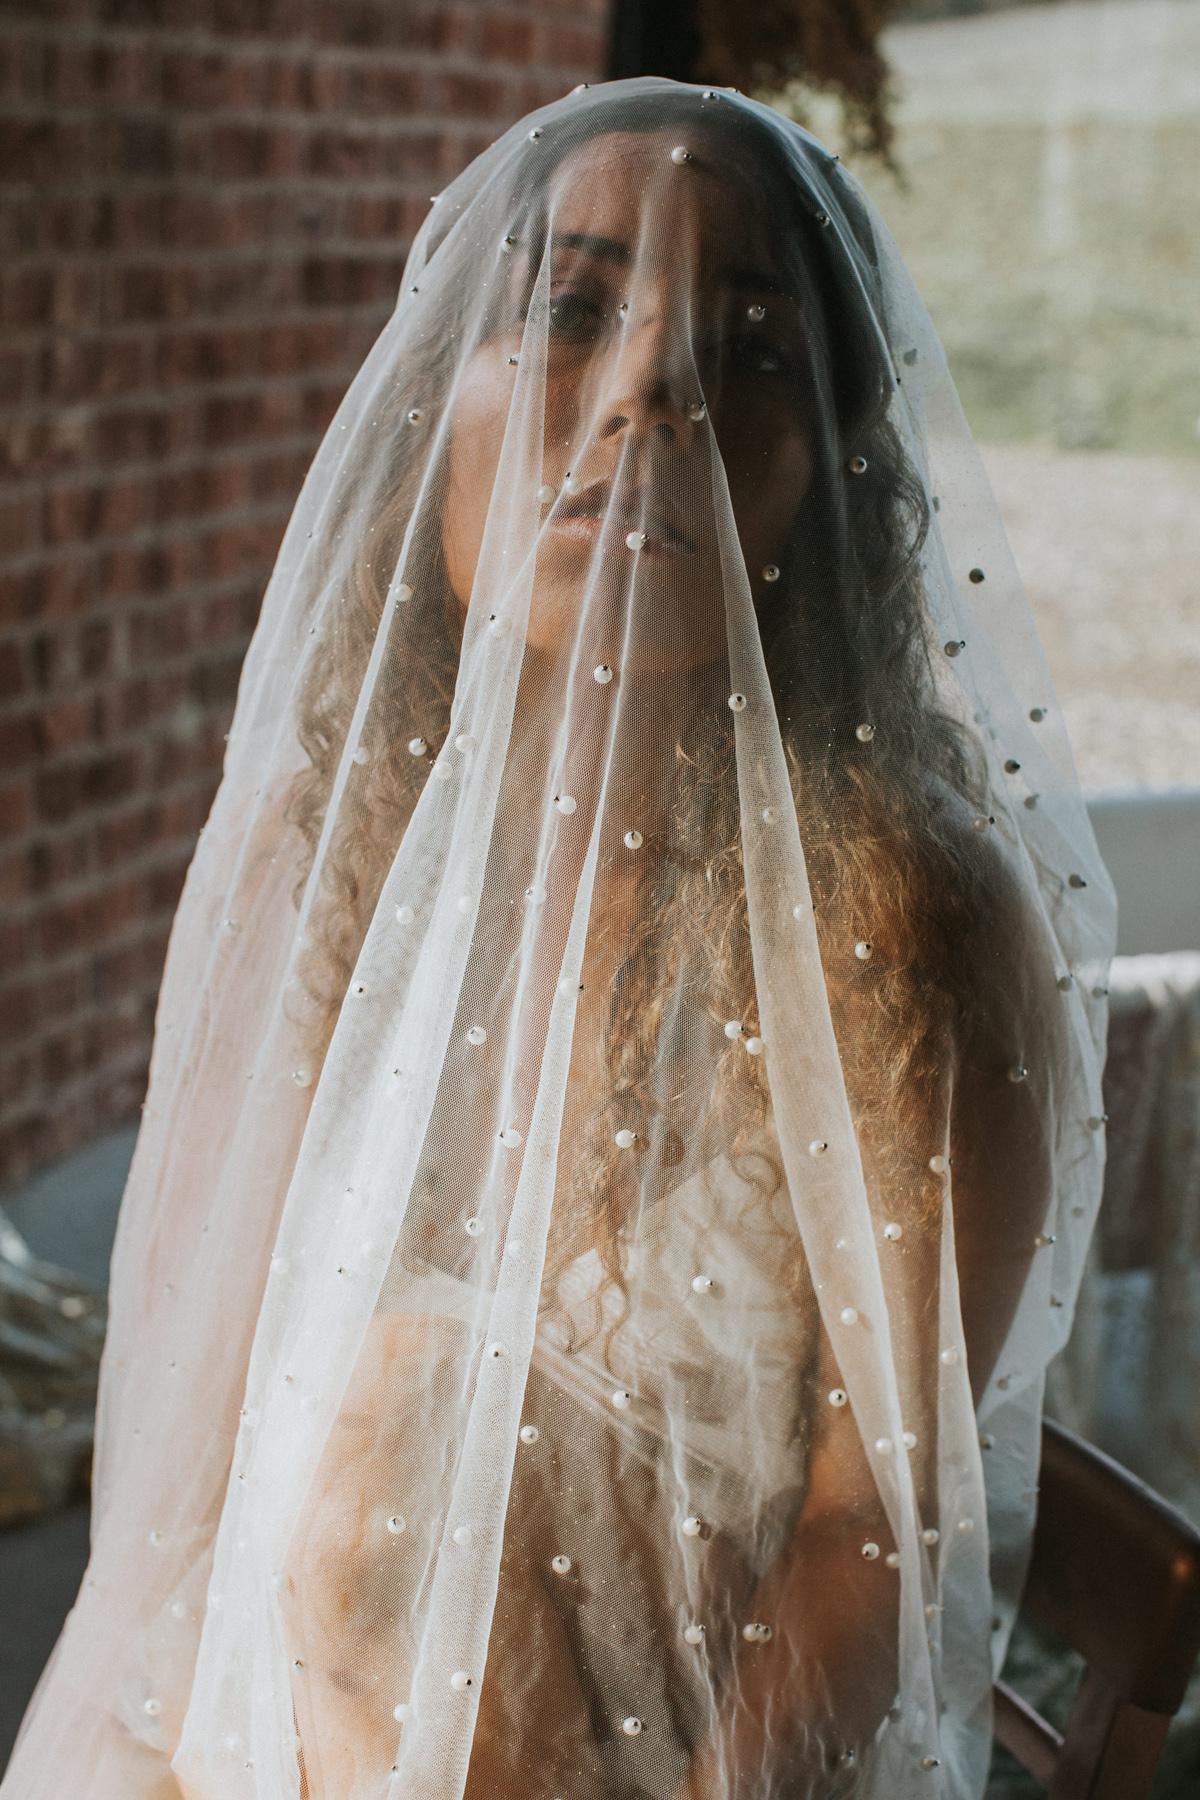 Avant Garde Rodarte Inspired wedding veils - An Avant Garde, Rodarte Inspired Wedding Veil Editorial